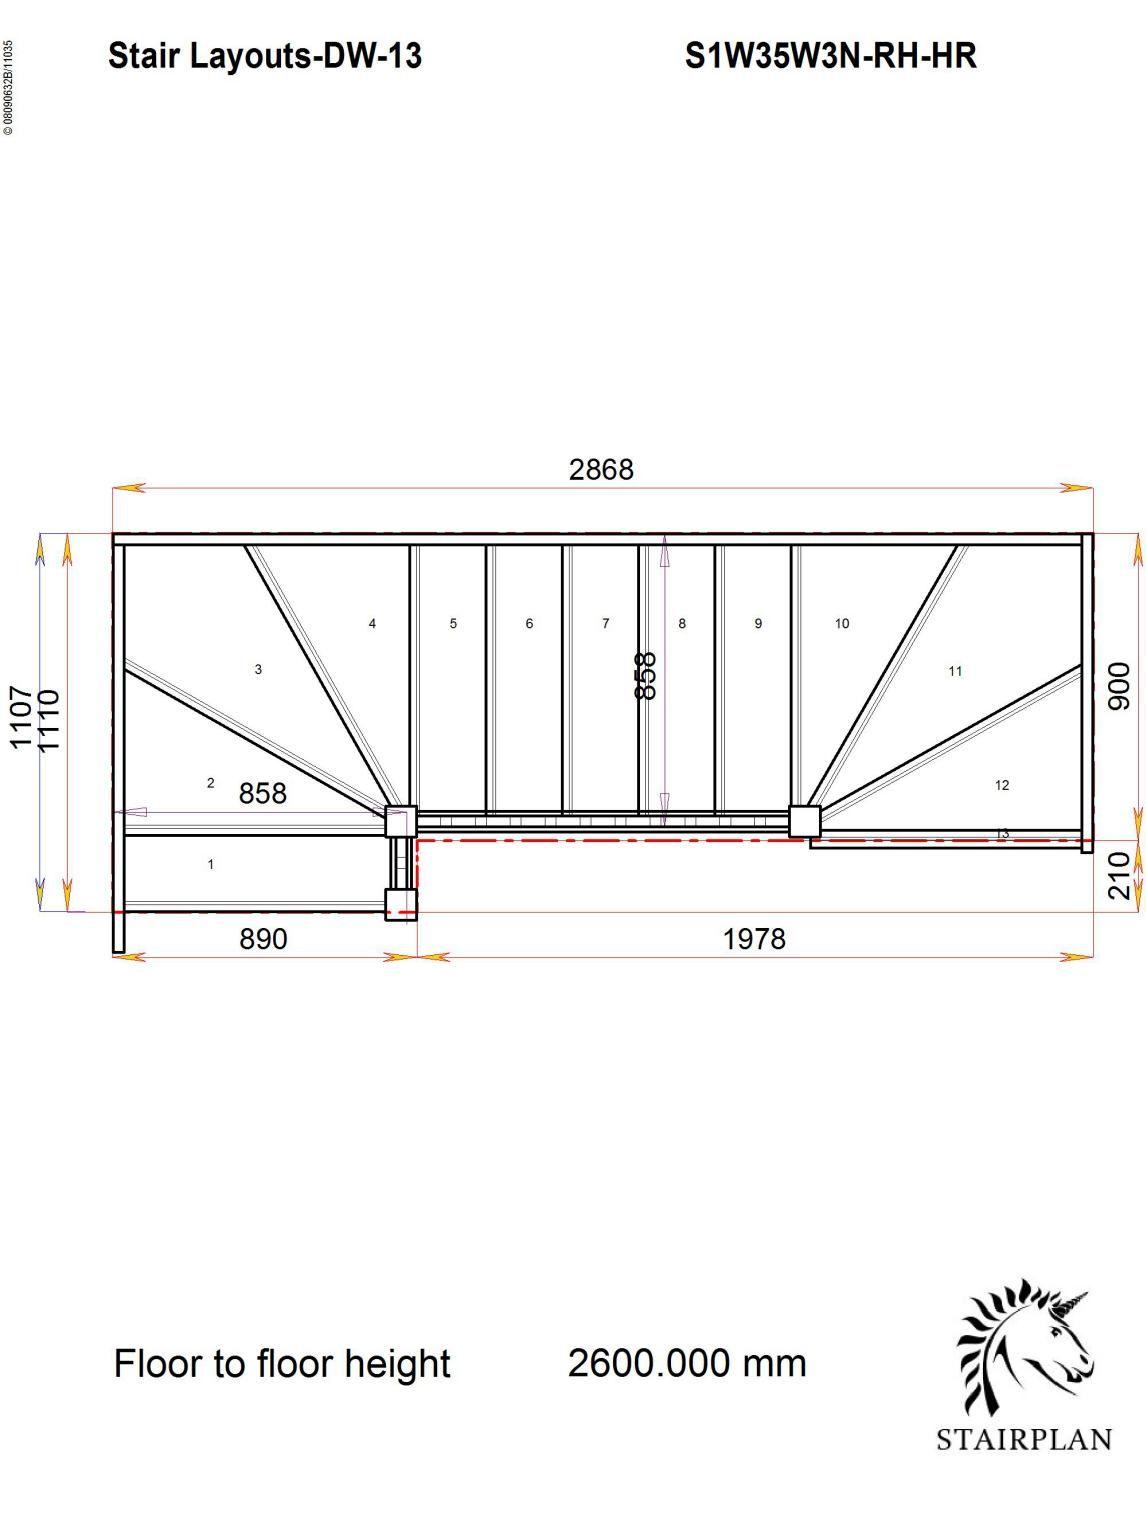 hight resolution of tradestairs rh double winder handrail